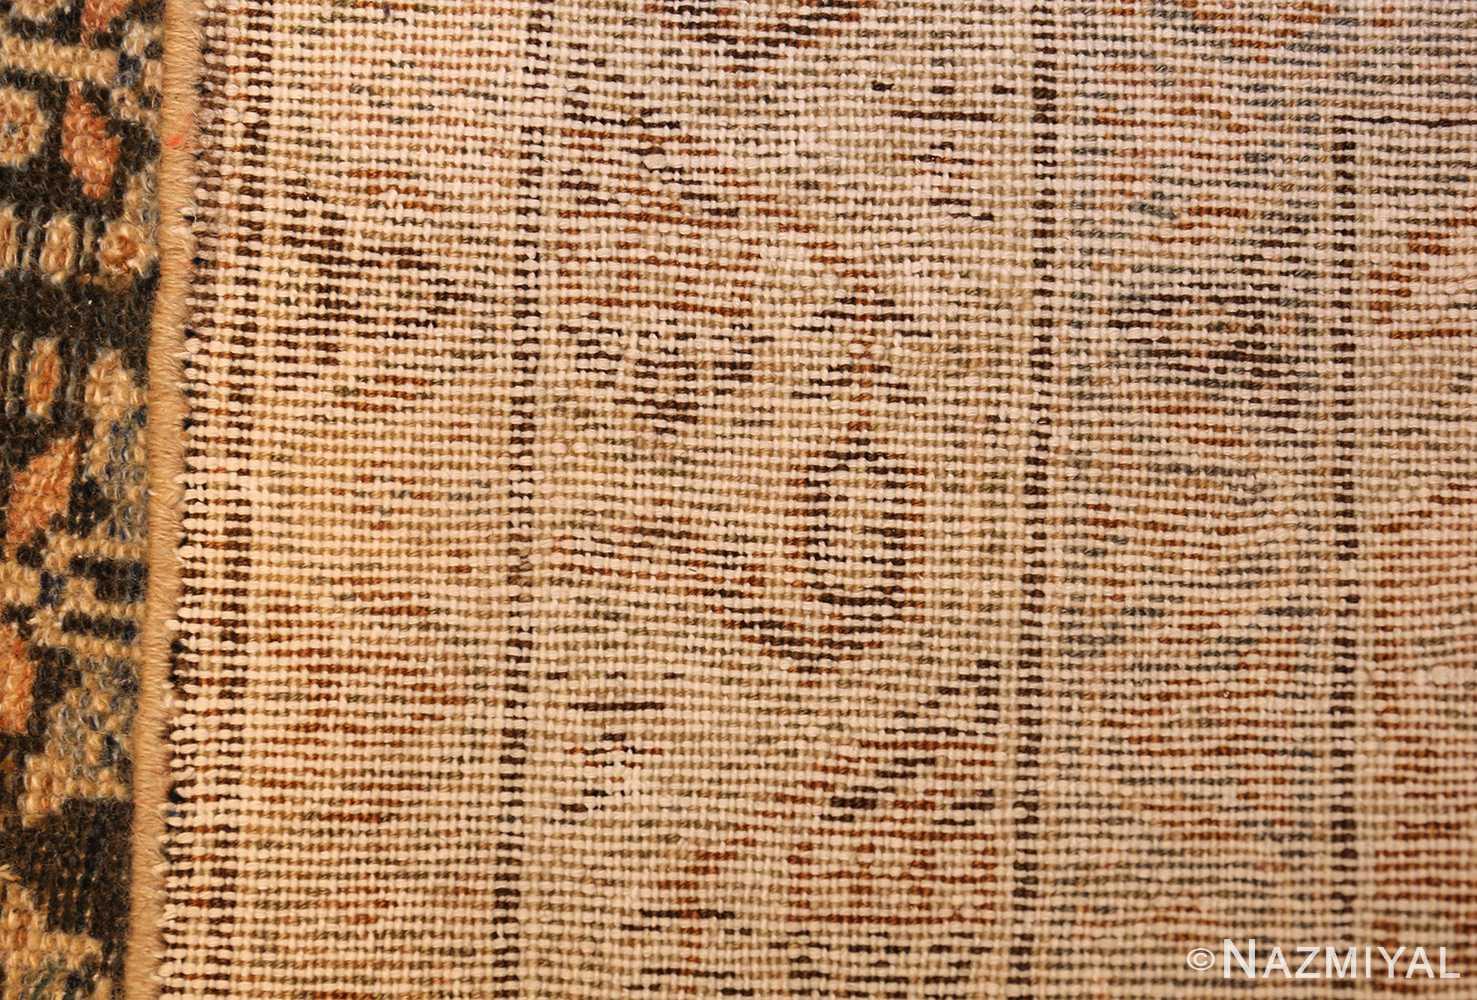 antique paisley design persian malayer runner rug 48824 weave Nazmiyal